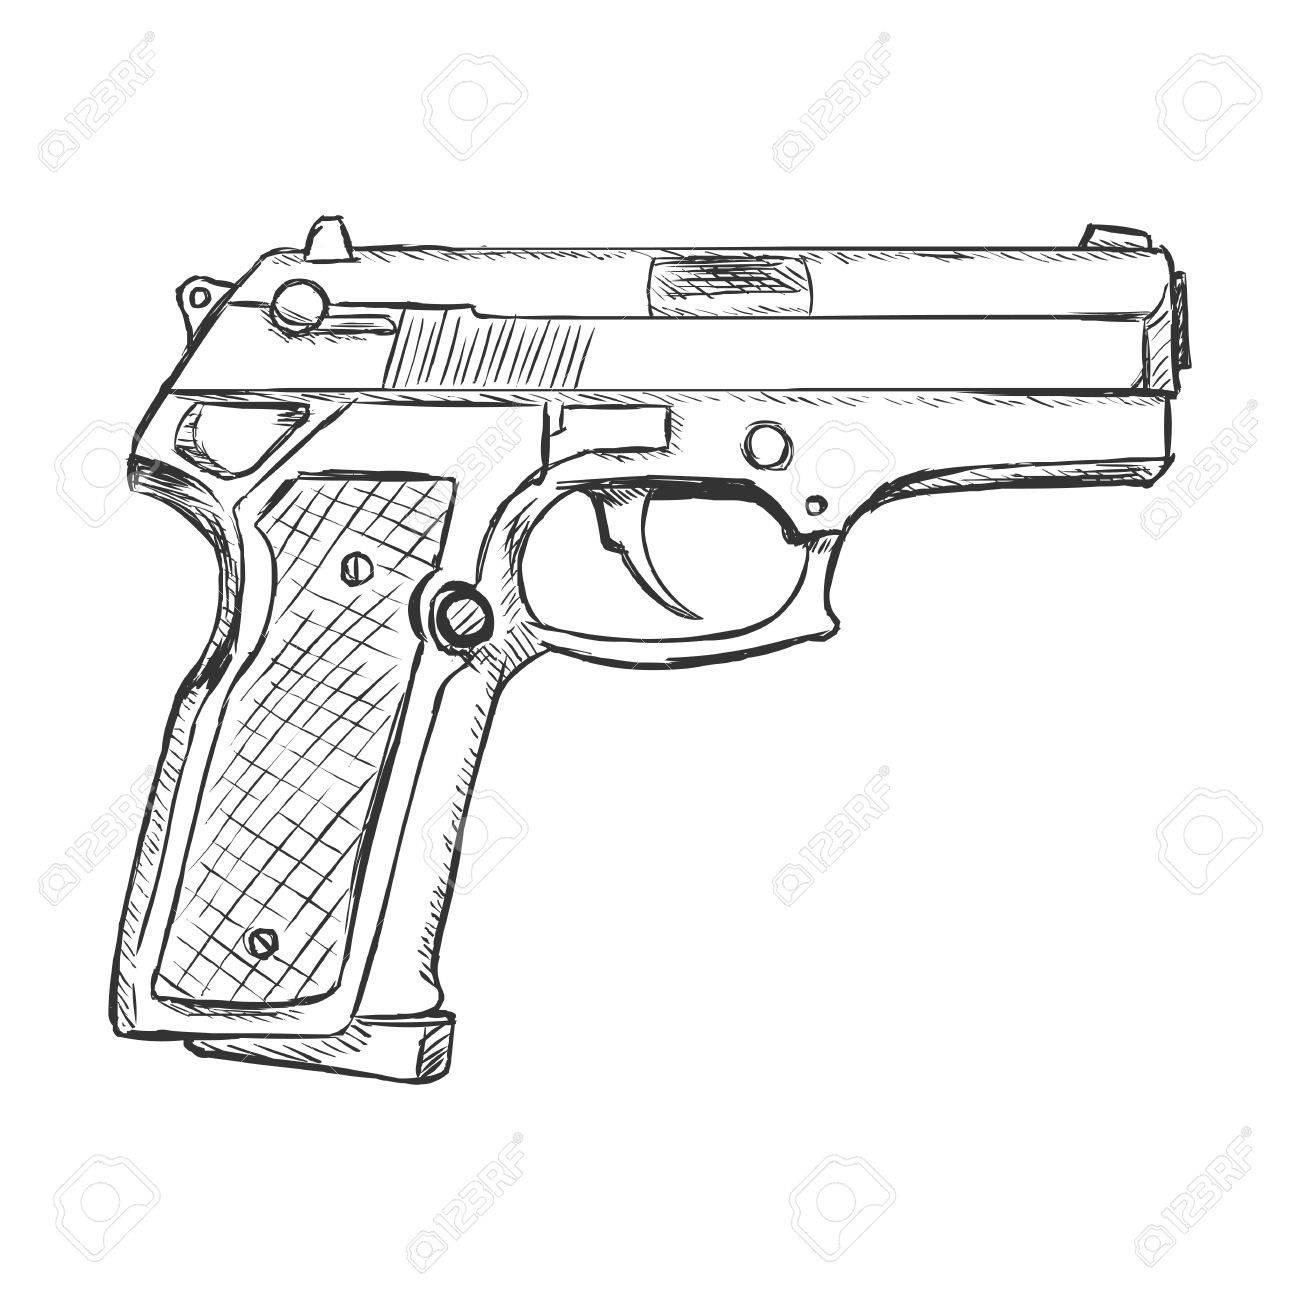 1300x1300 Vector Sketch Beretta Pistol On White Background Royalty Free